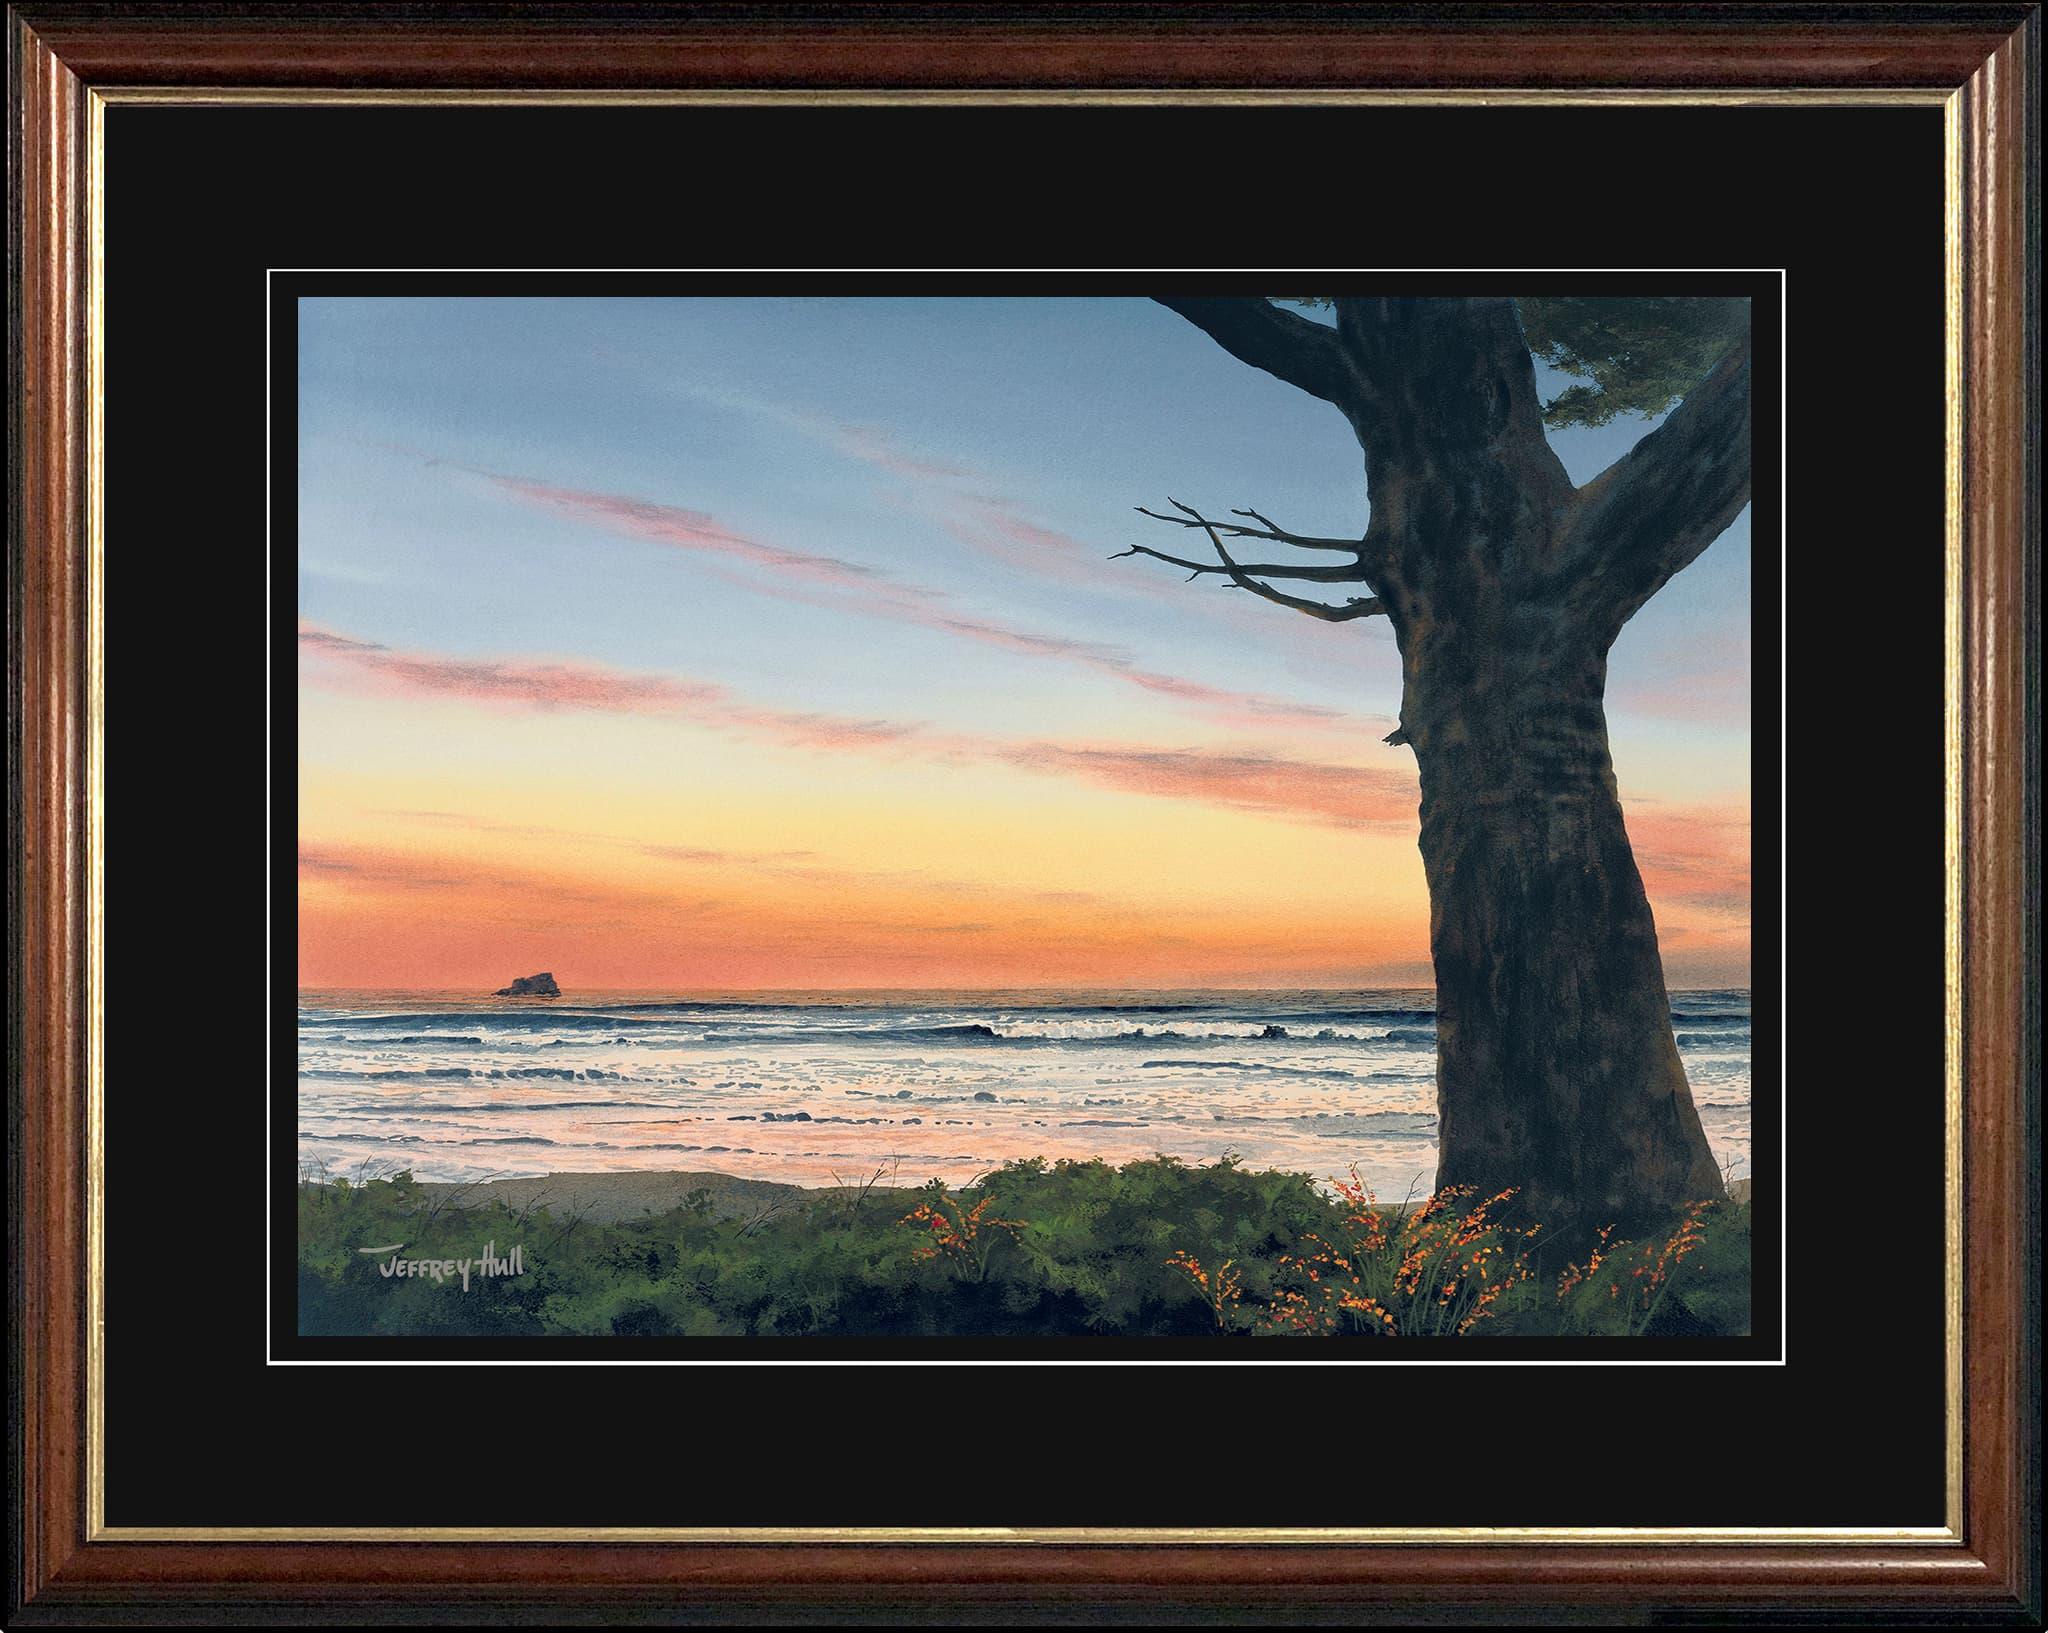 Sunset-Overlook-LimEd-Malabar-Jet-Black-4-Website-2021